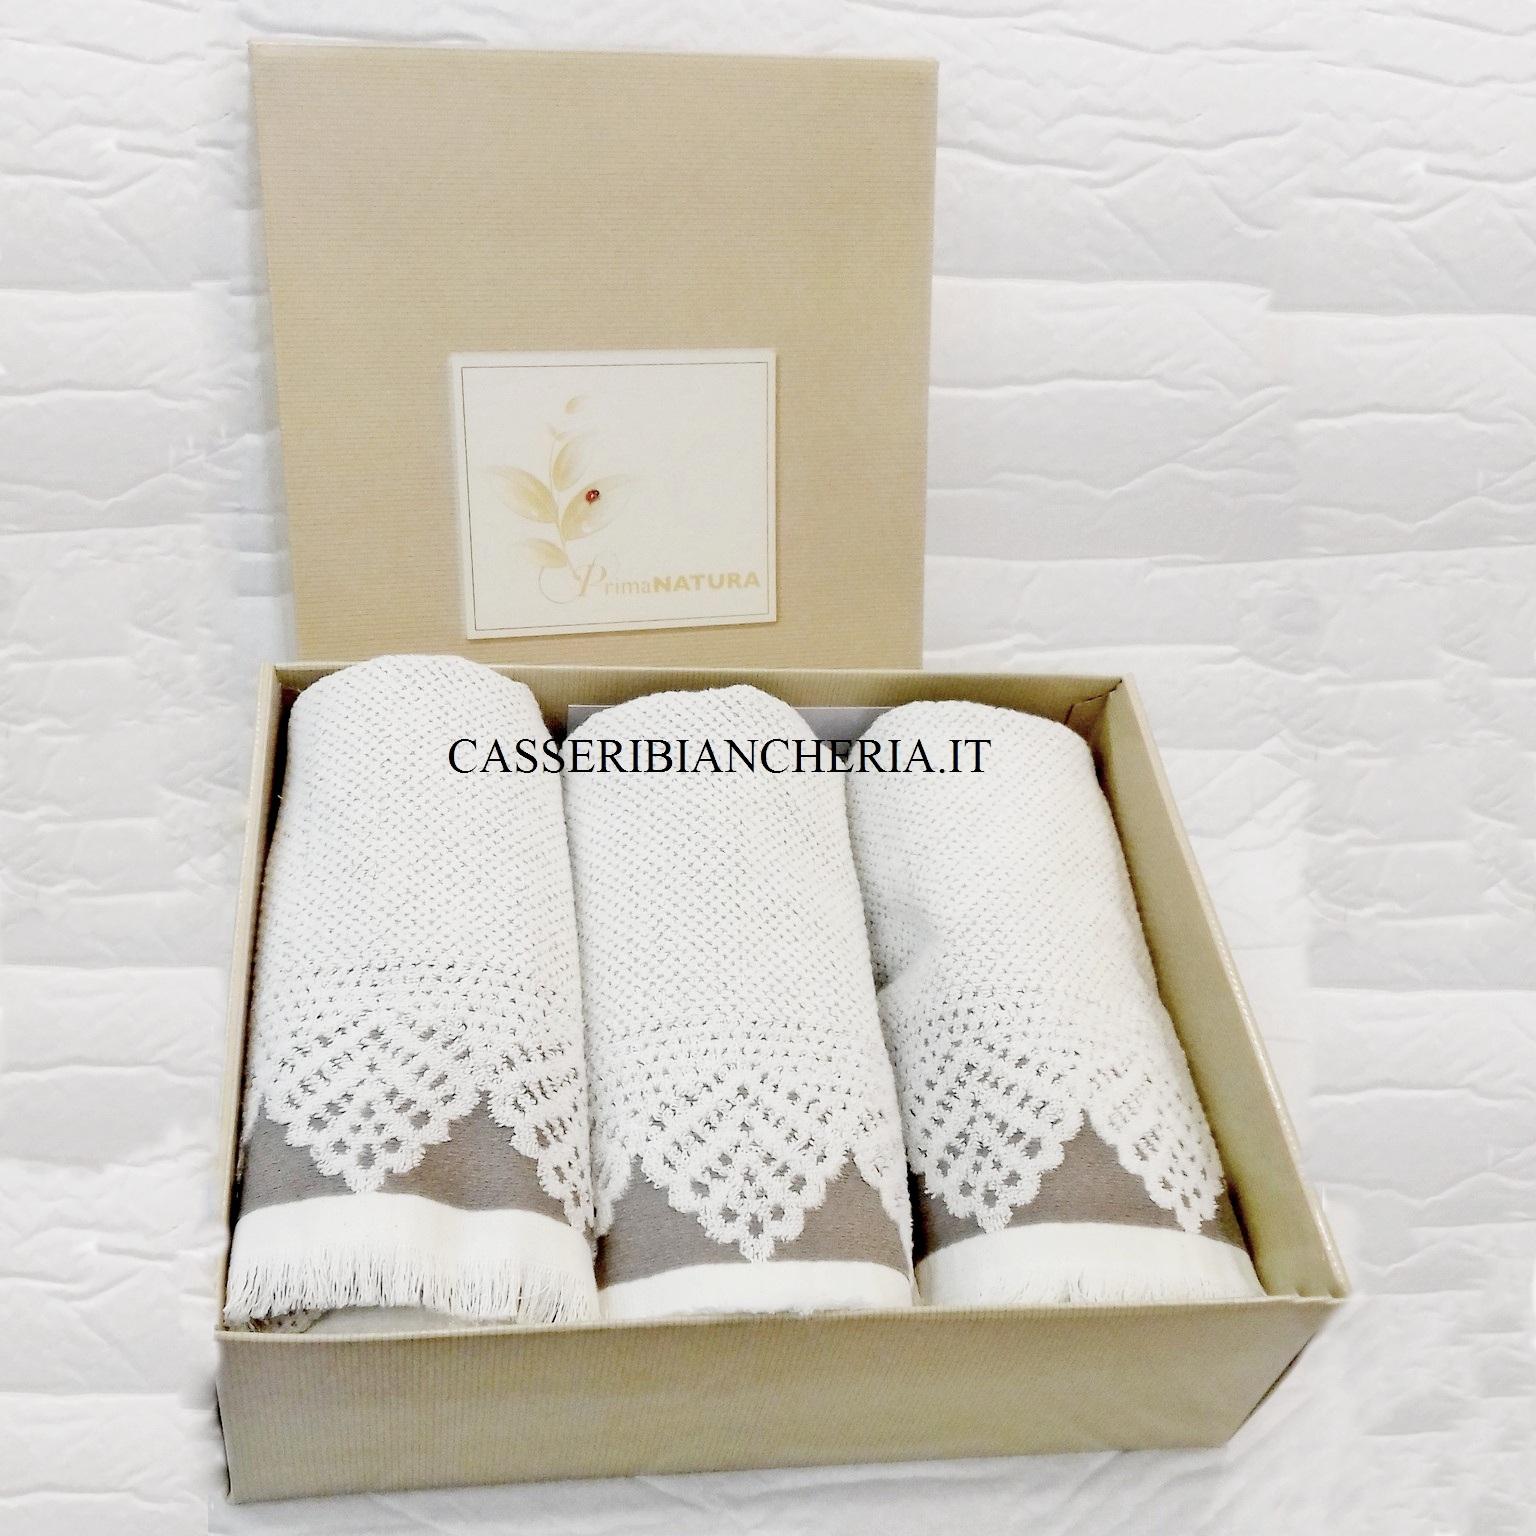 Scatola 3 coppie asciugamani caleffi procida bianco for Asciugamani caleffi